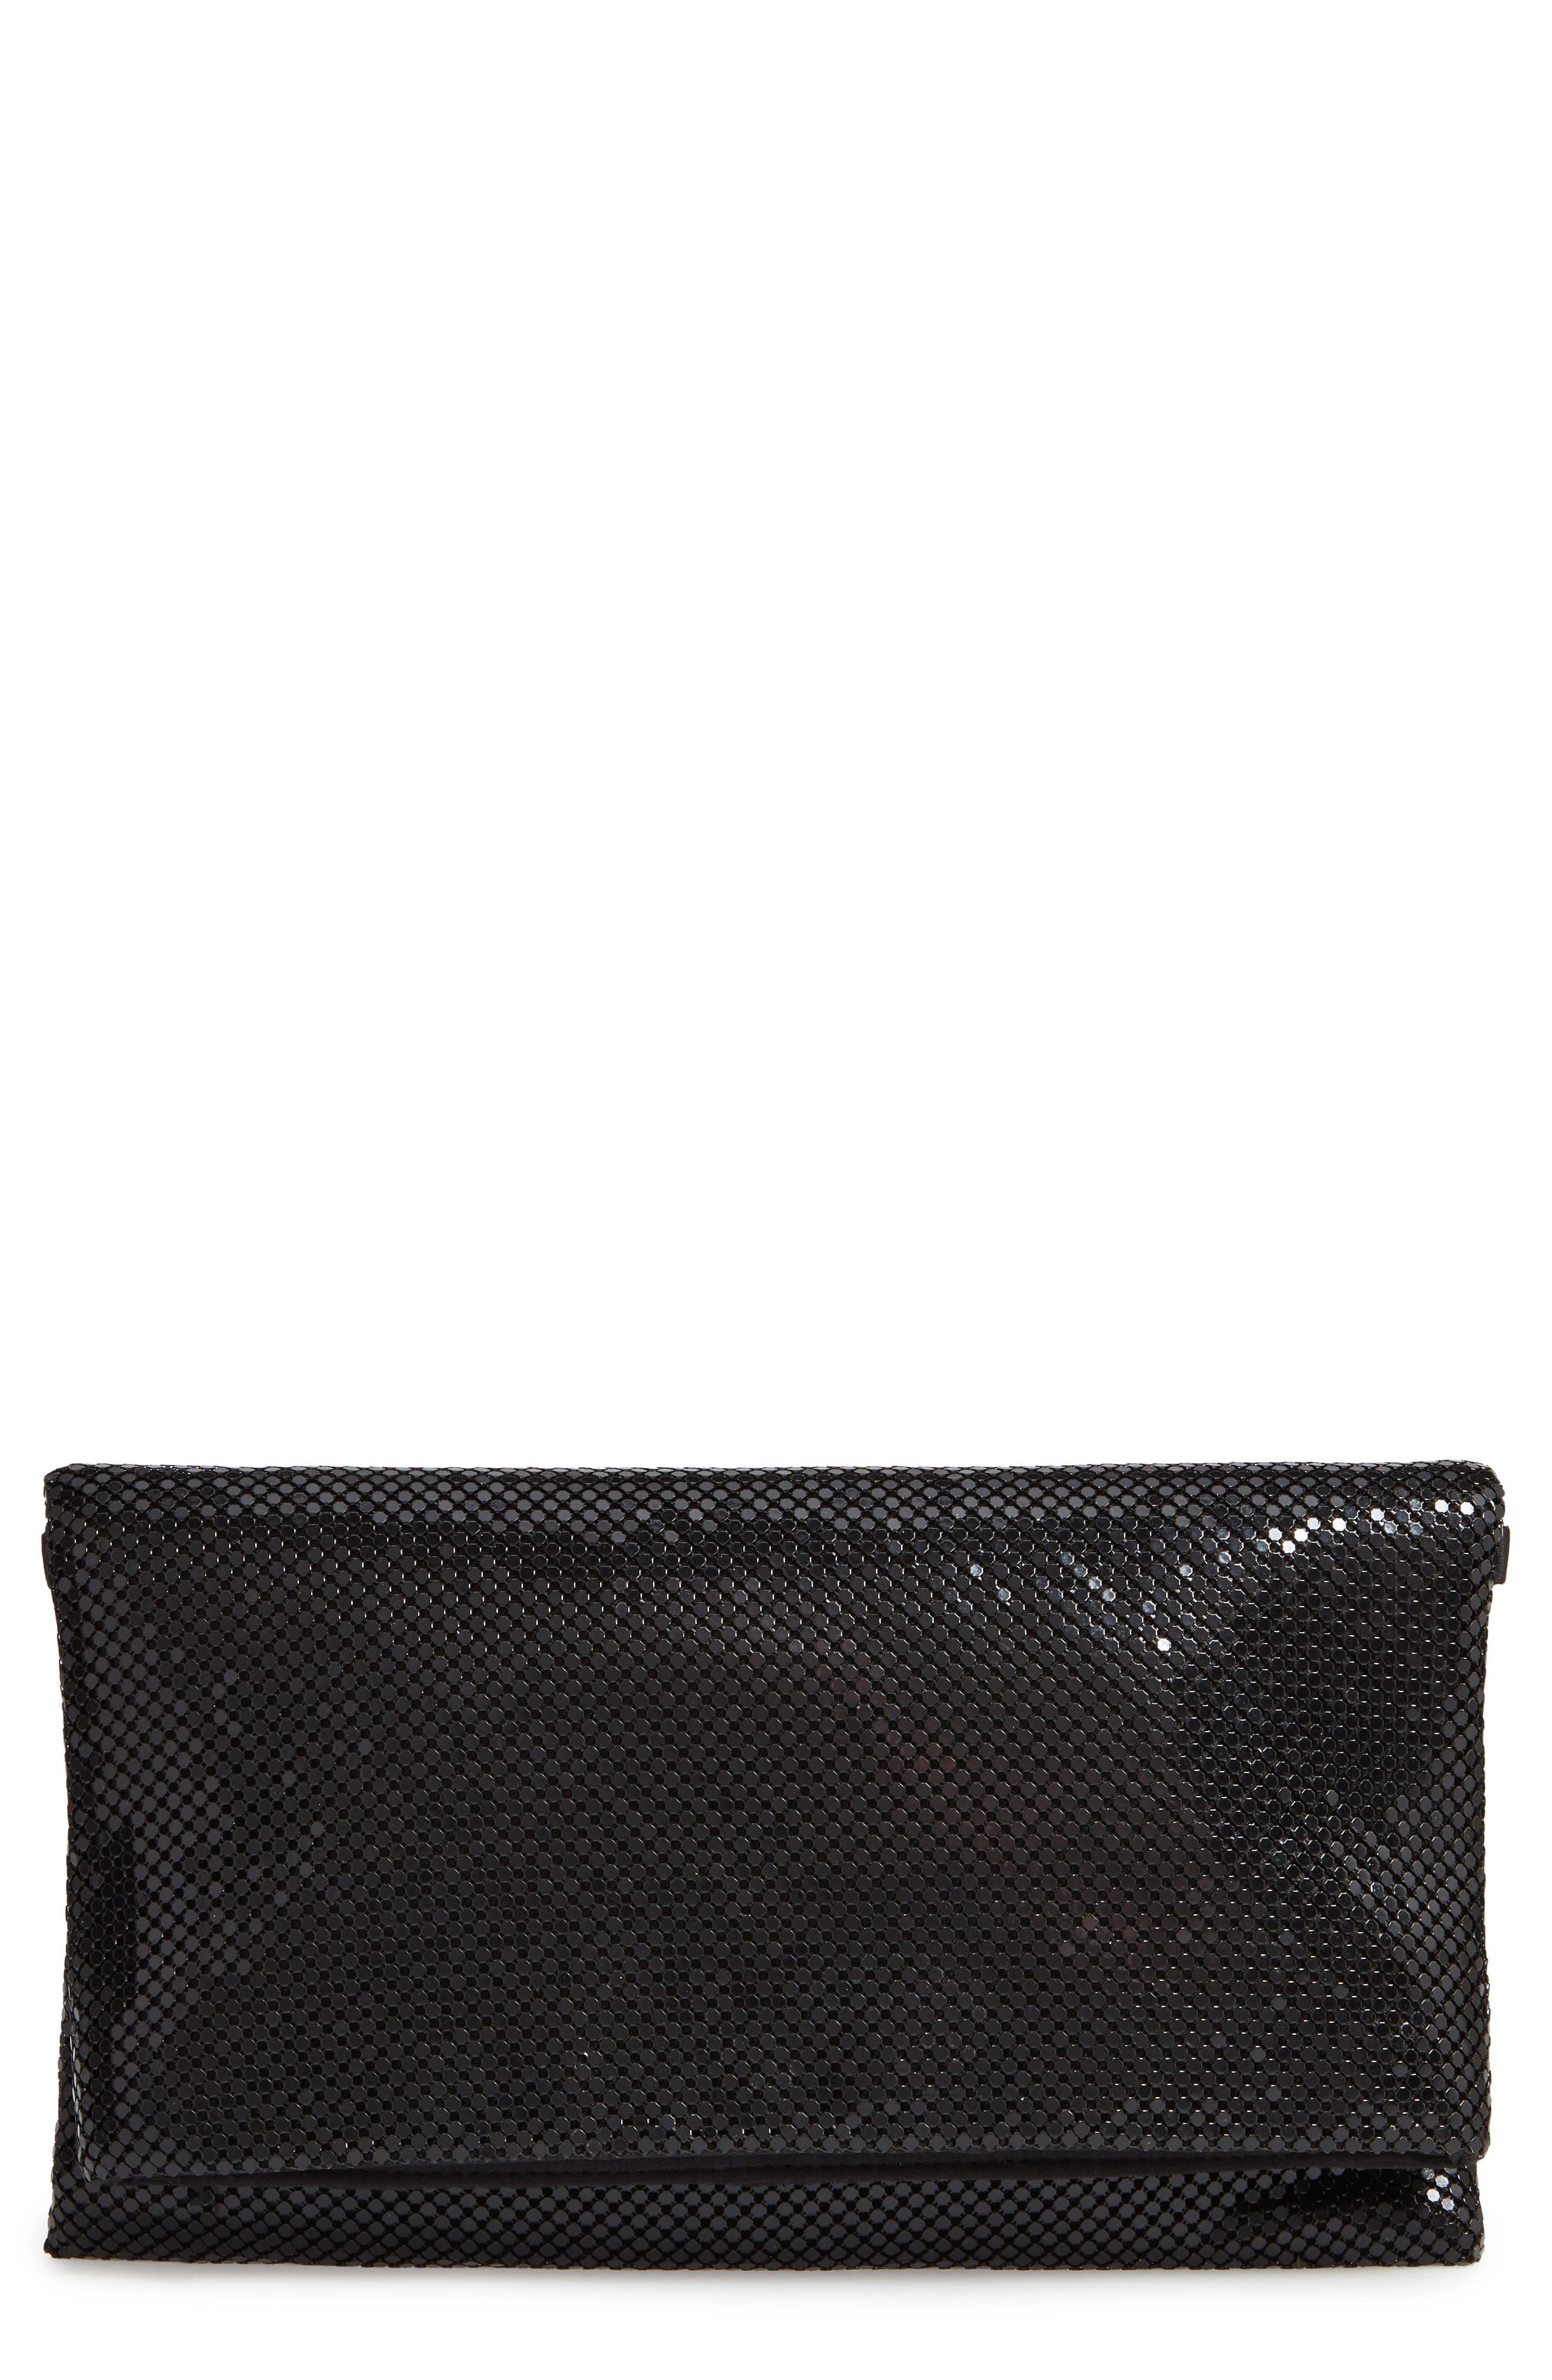 Crystal Mesh Crossbody Bag,                             Main thumbnail 1, color,                             BLACK